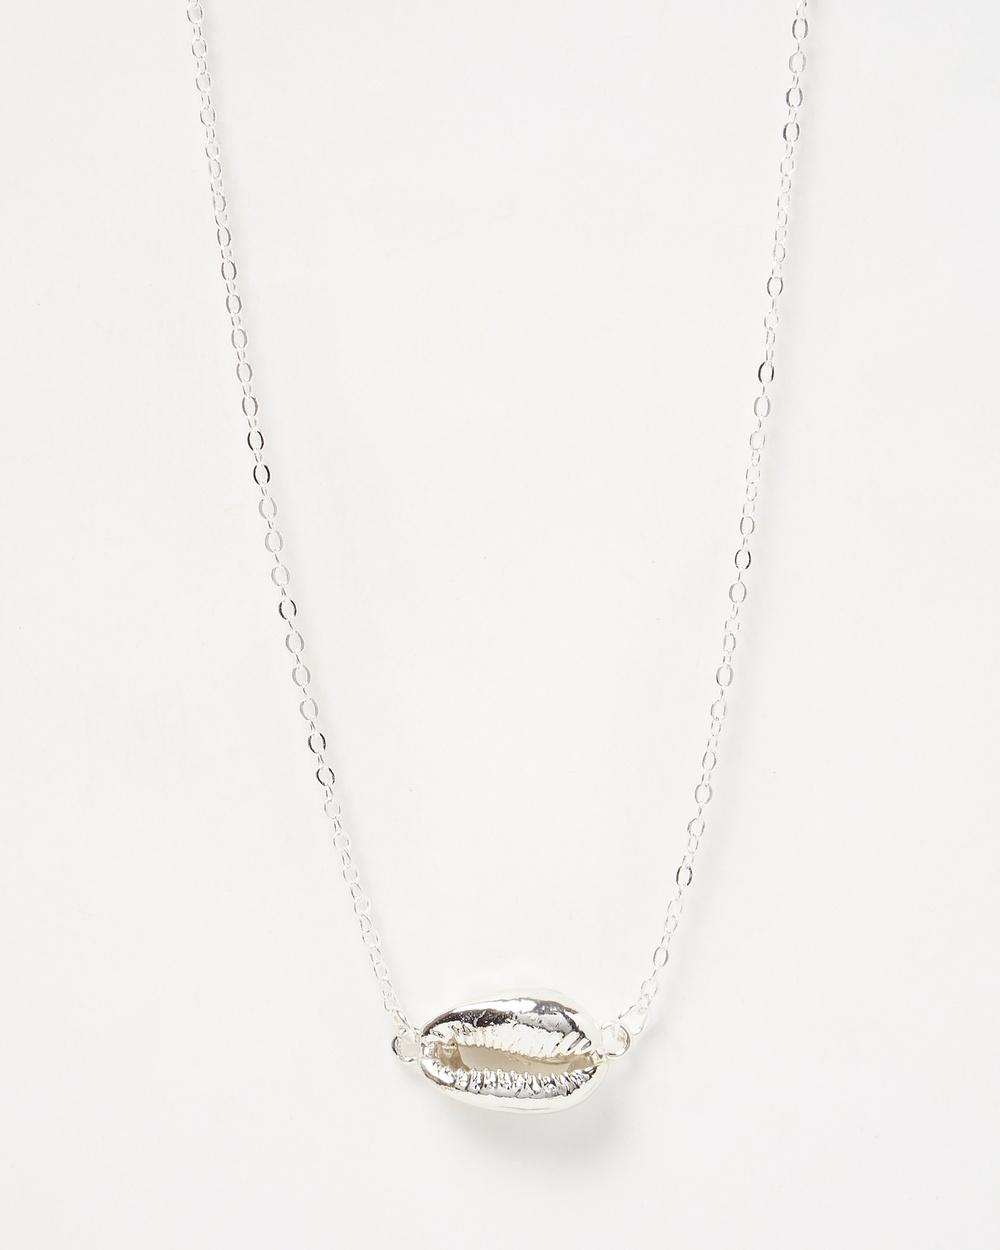 Miz Casa and Co Arue Island Necklace Jewellery Silver